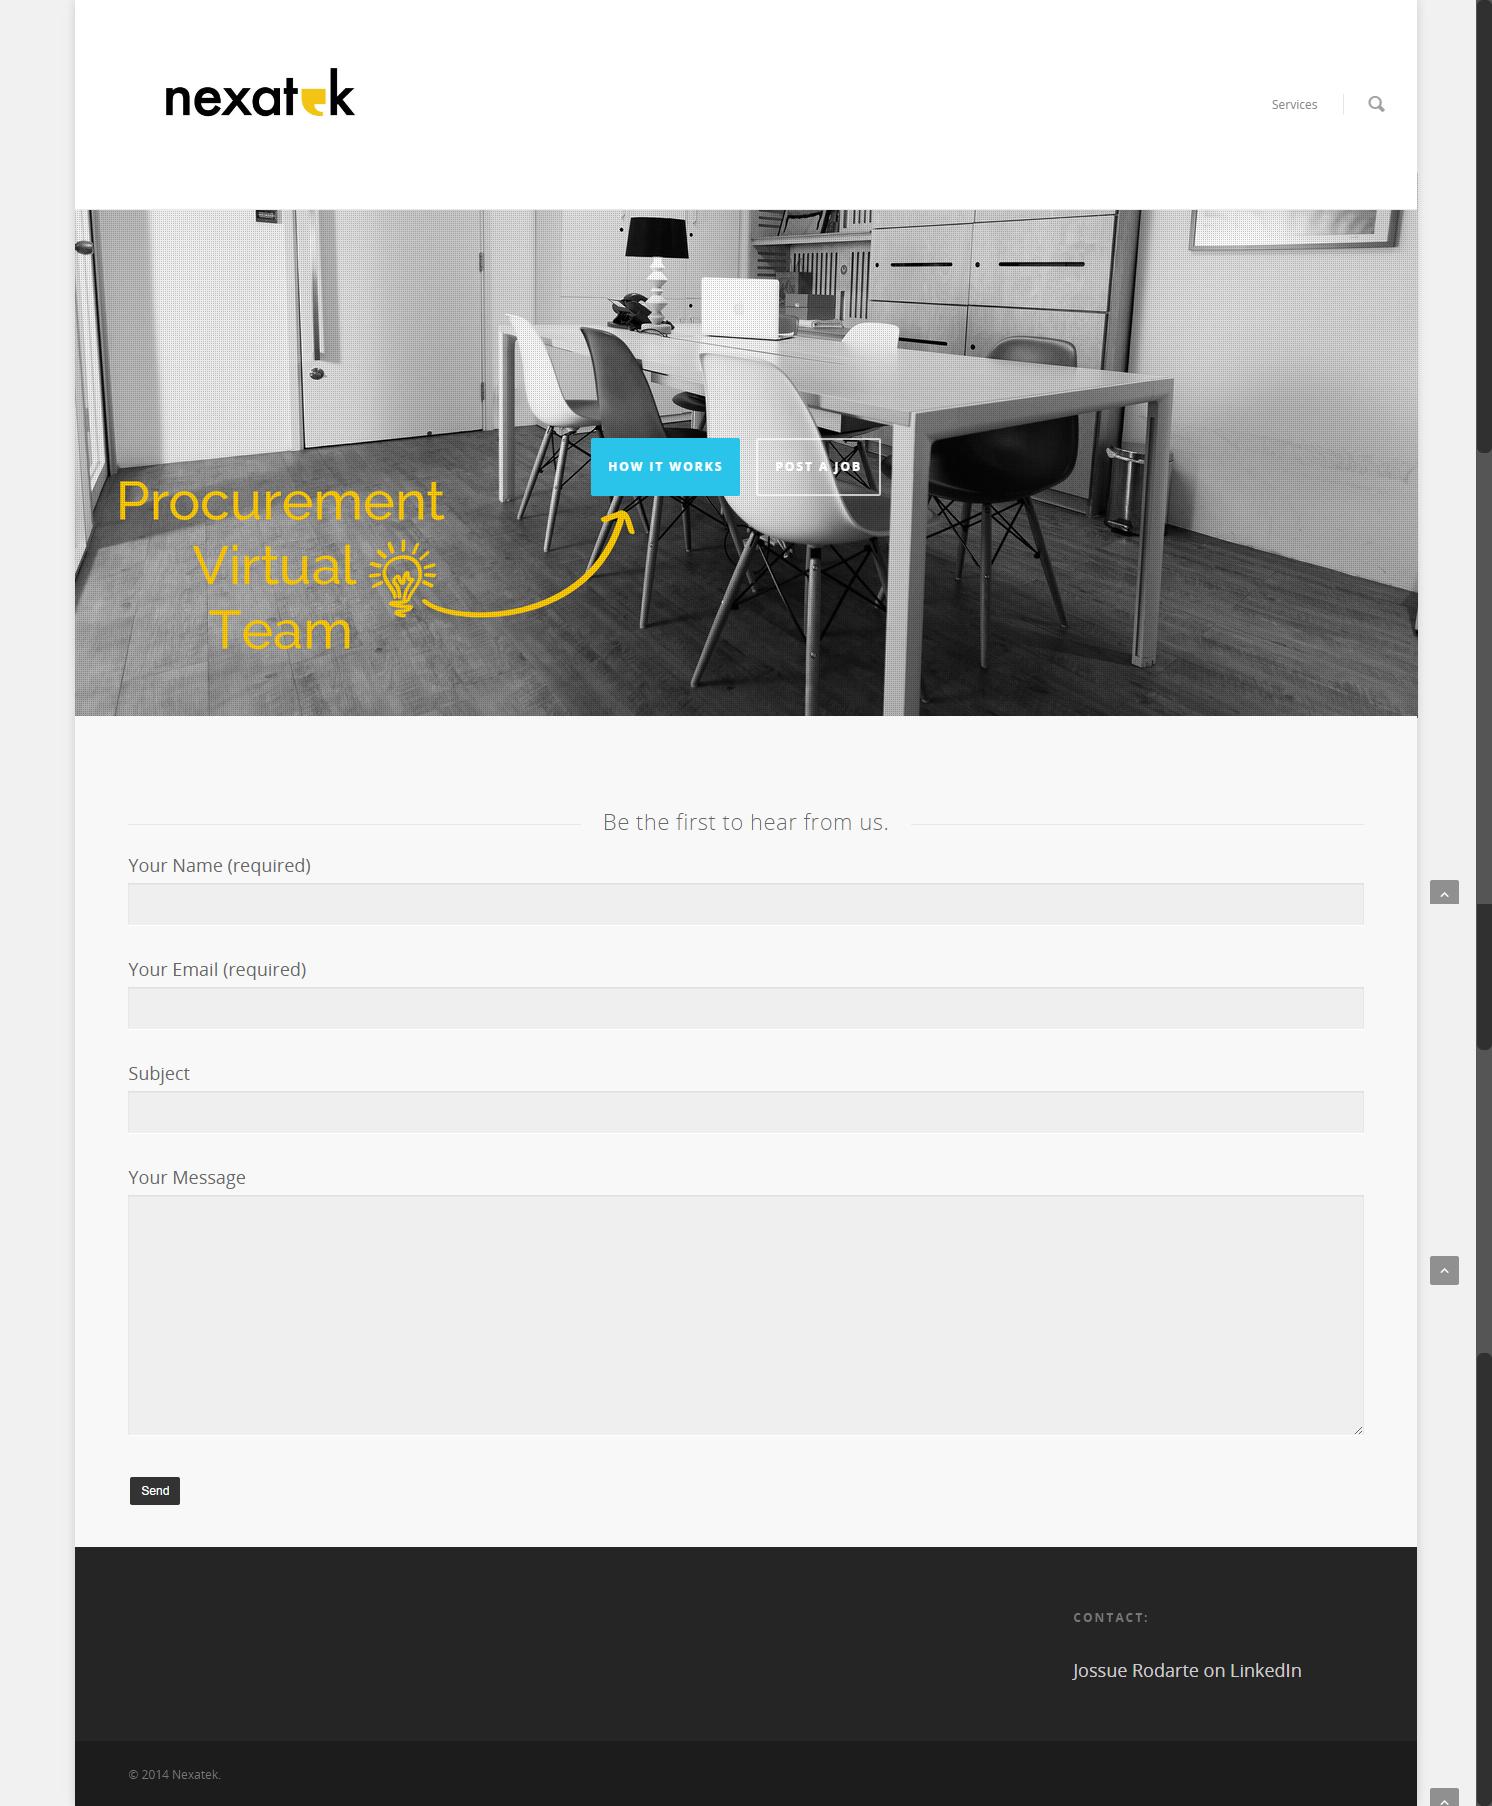 screenshot-www.nexatek.co 2014-10-17 21-03-49